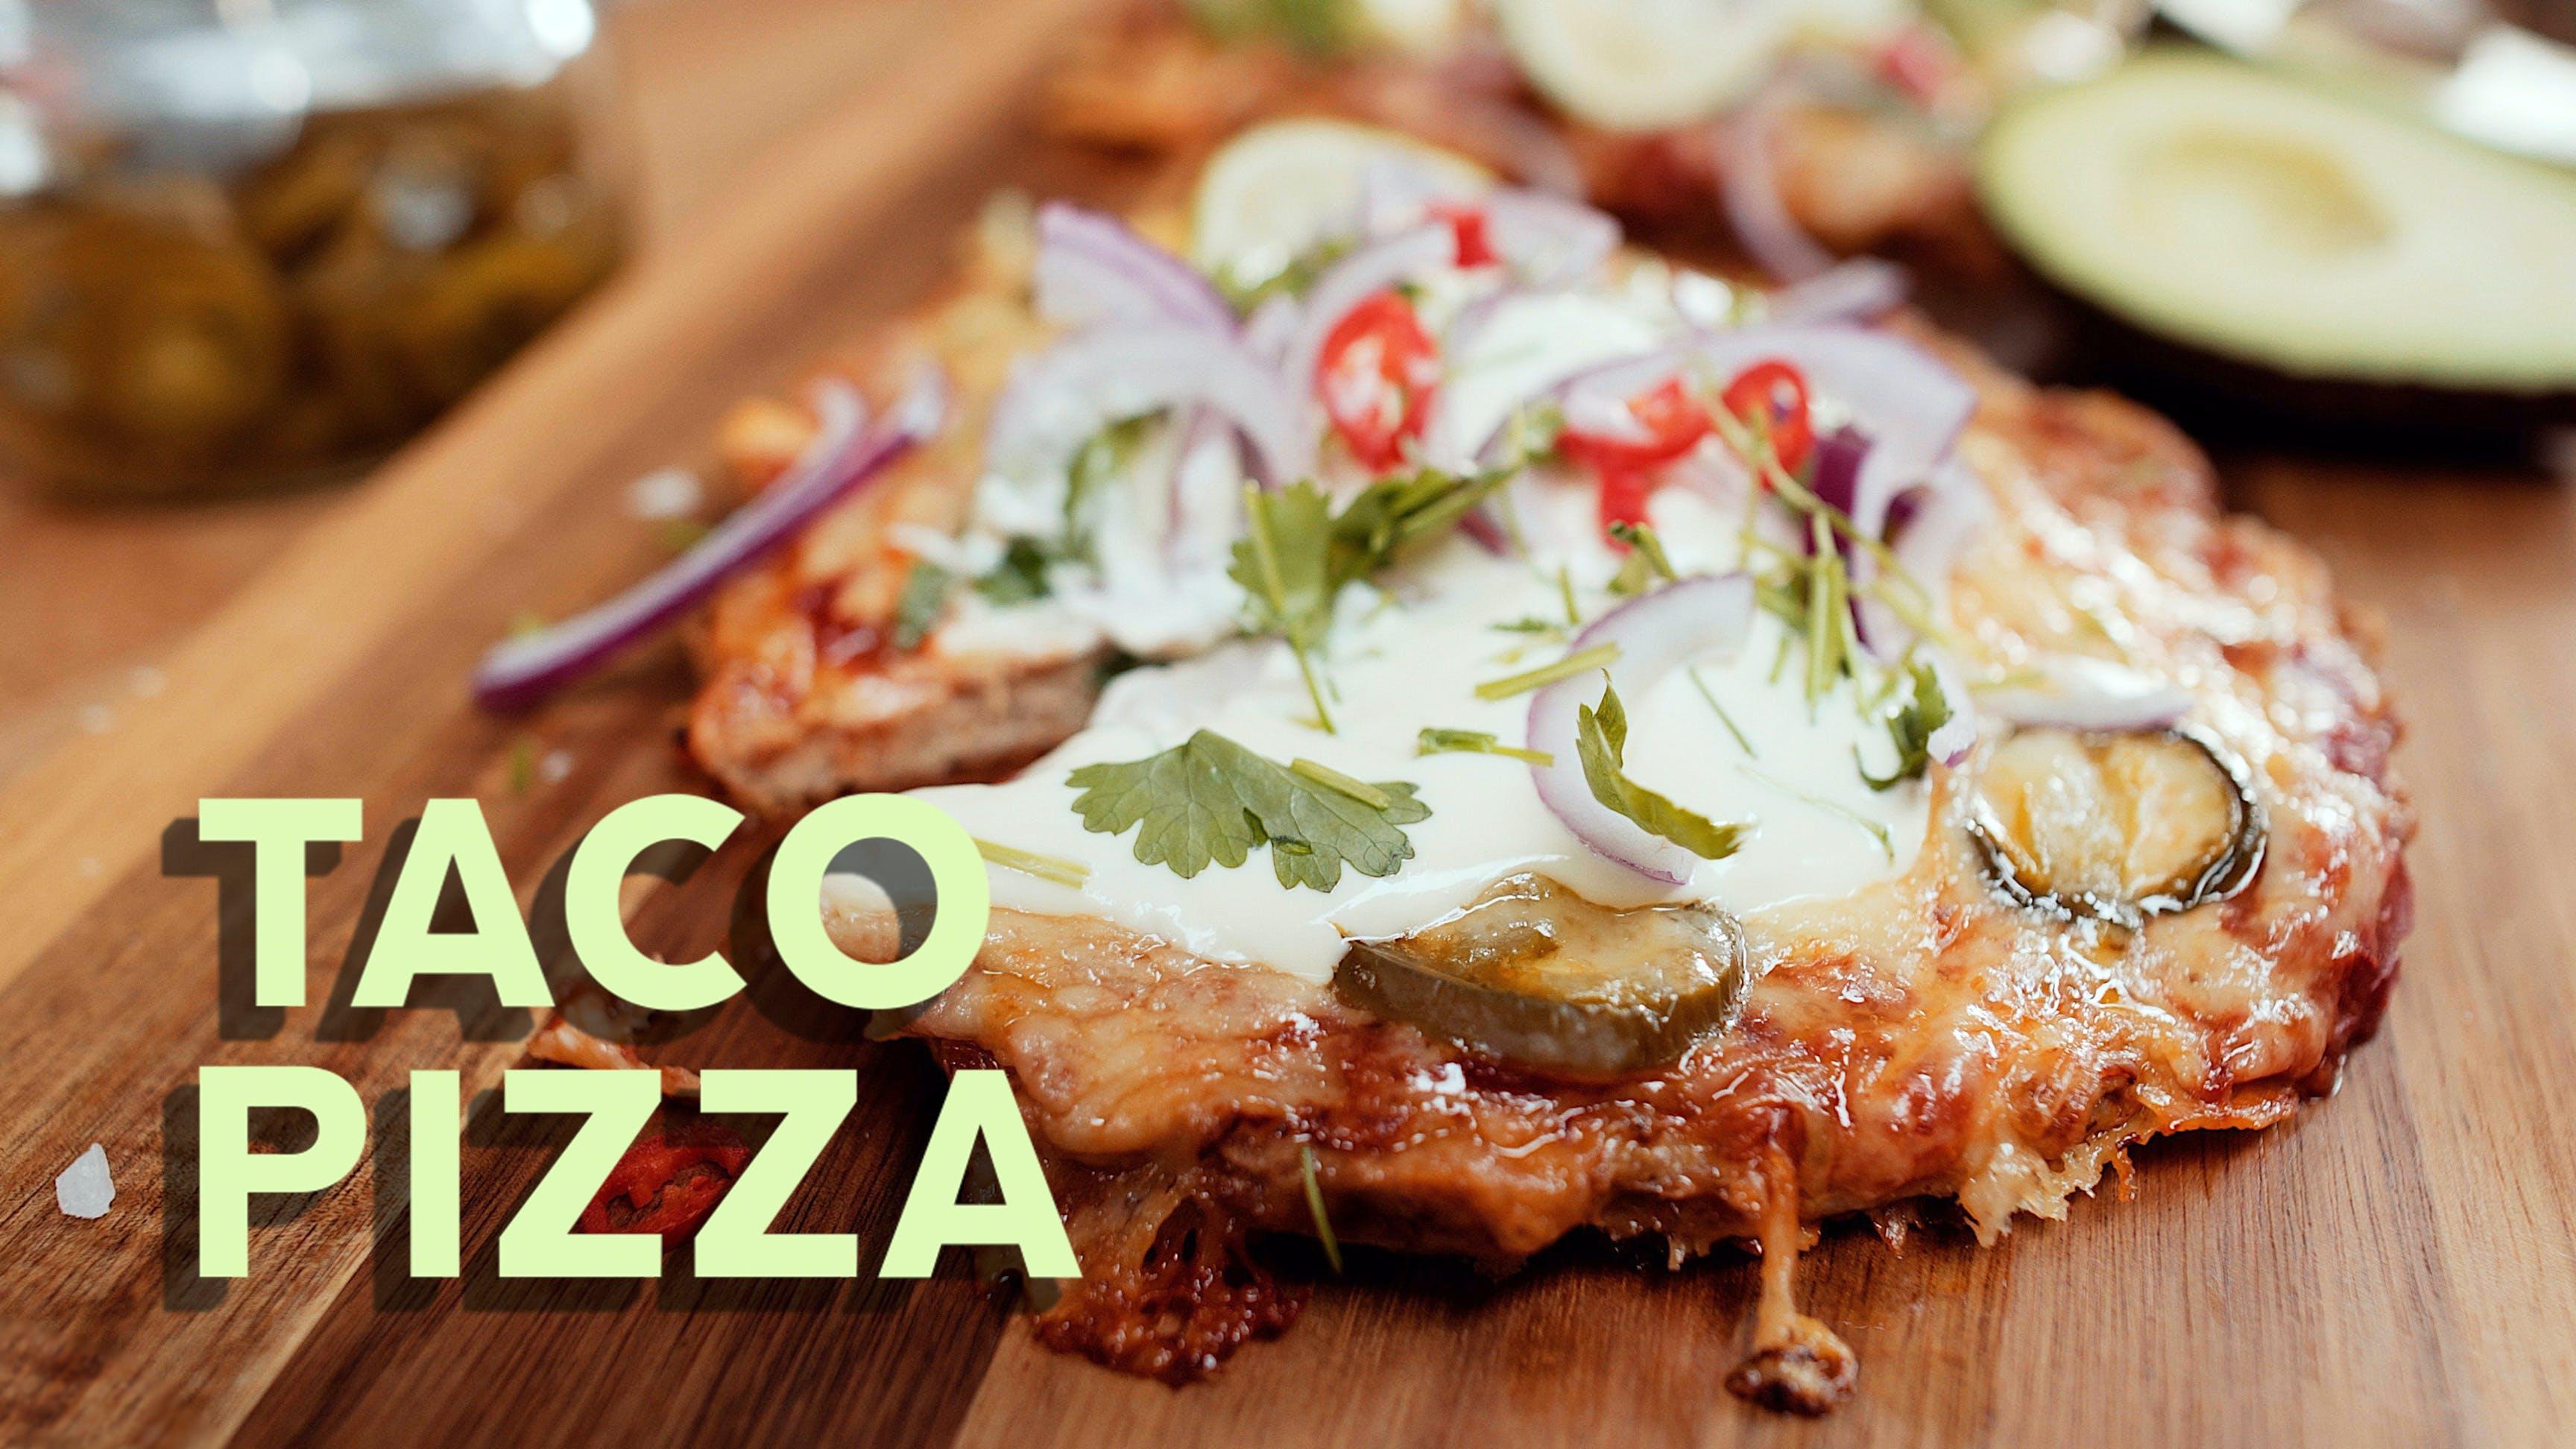 Taco Pizza, receta en video